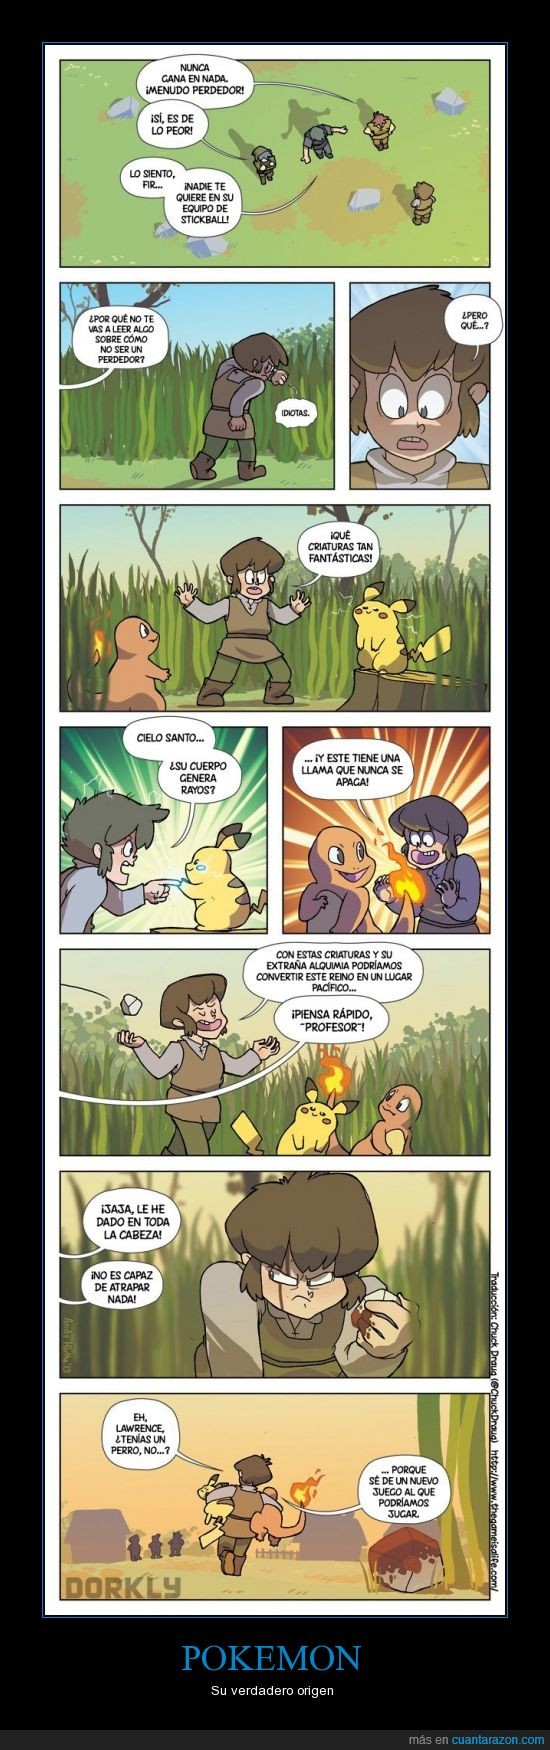 bully,charmander,luchar,origen,perro,piedra,pikachu